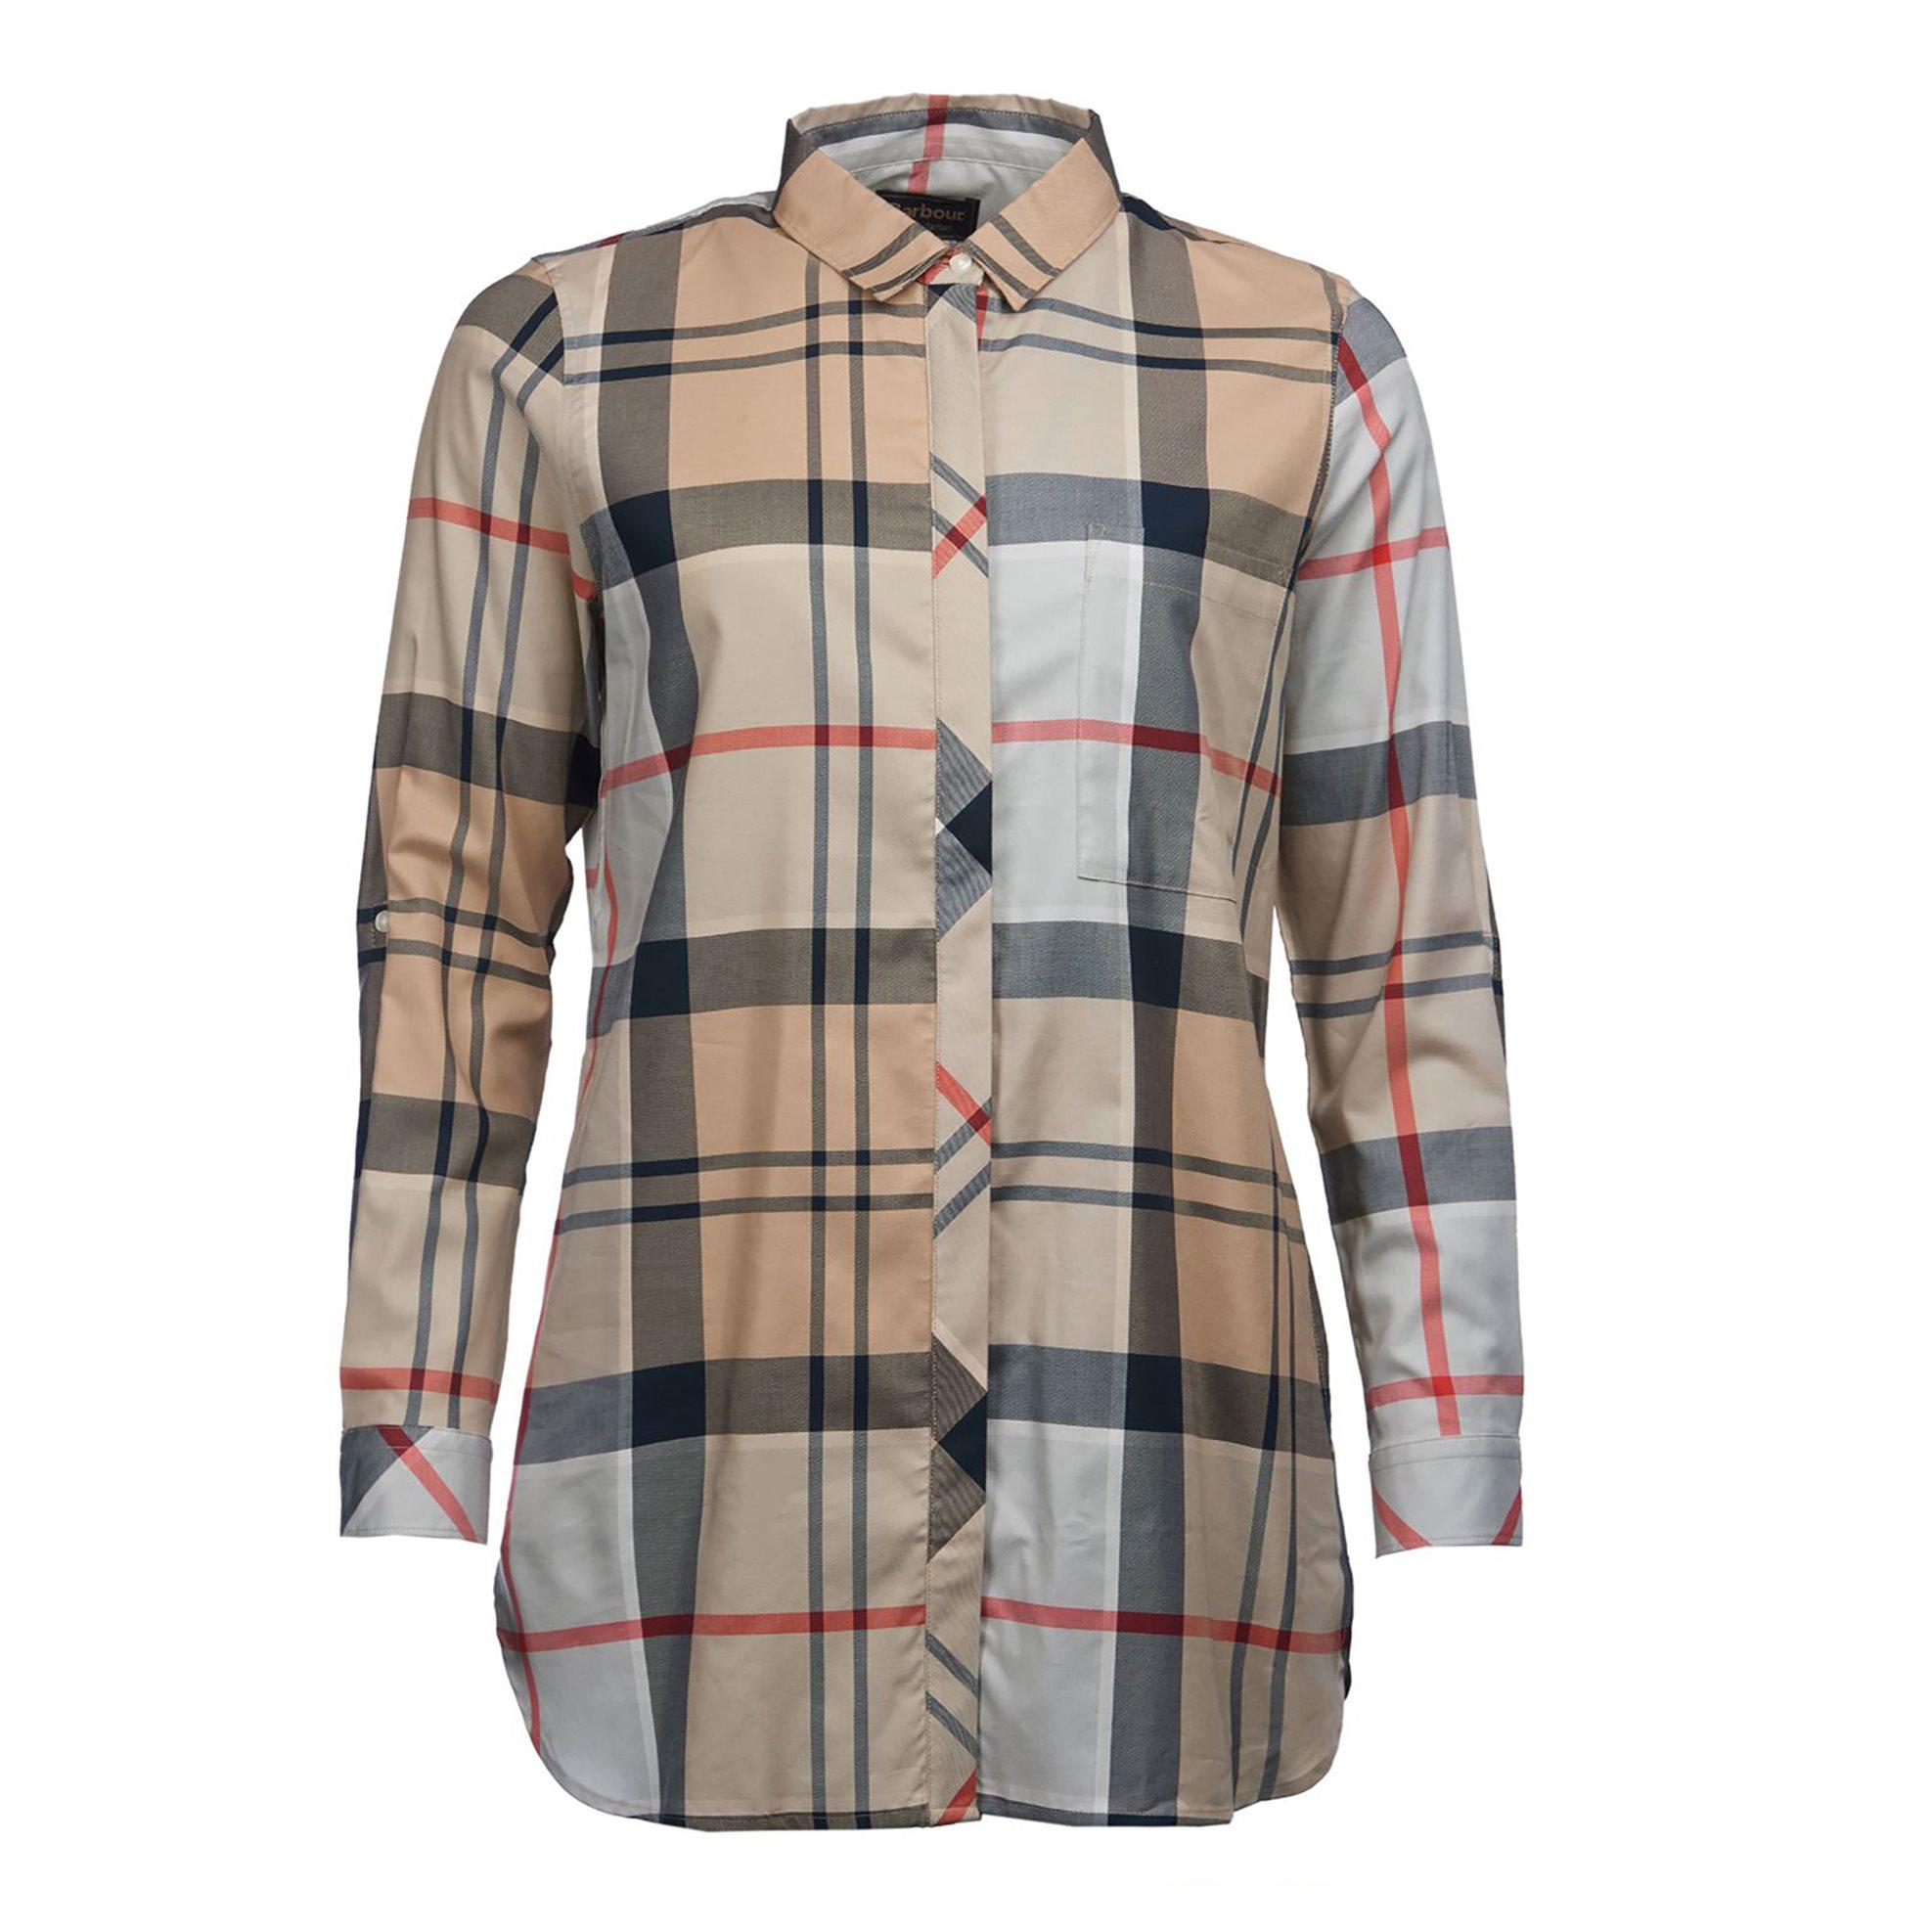 Barbour γυναικεία πουκαμίσα καρό Balmedie - LSH1186 - Μπεζ γυναικα   ρουχα   tops   πουκάμισα   πουκαμίσες   καφτάνια   casual